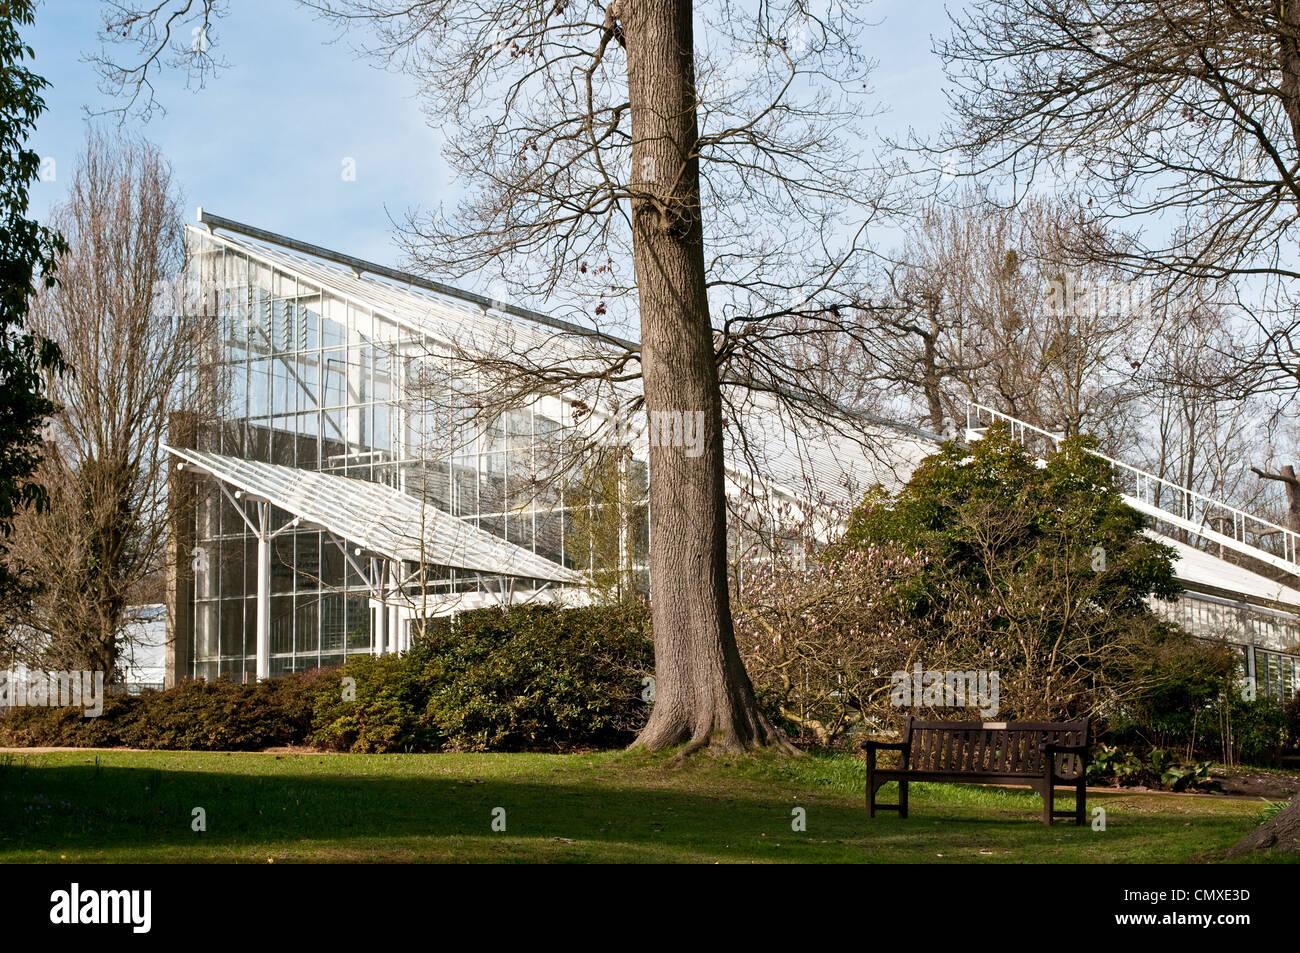 Queen Elizabeth Temperate House, Savill Garden, Berkshire, England, UK - Stock Image